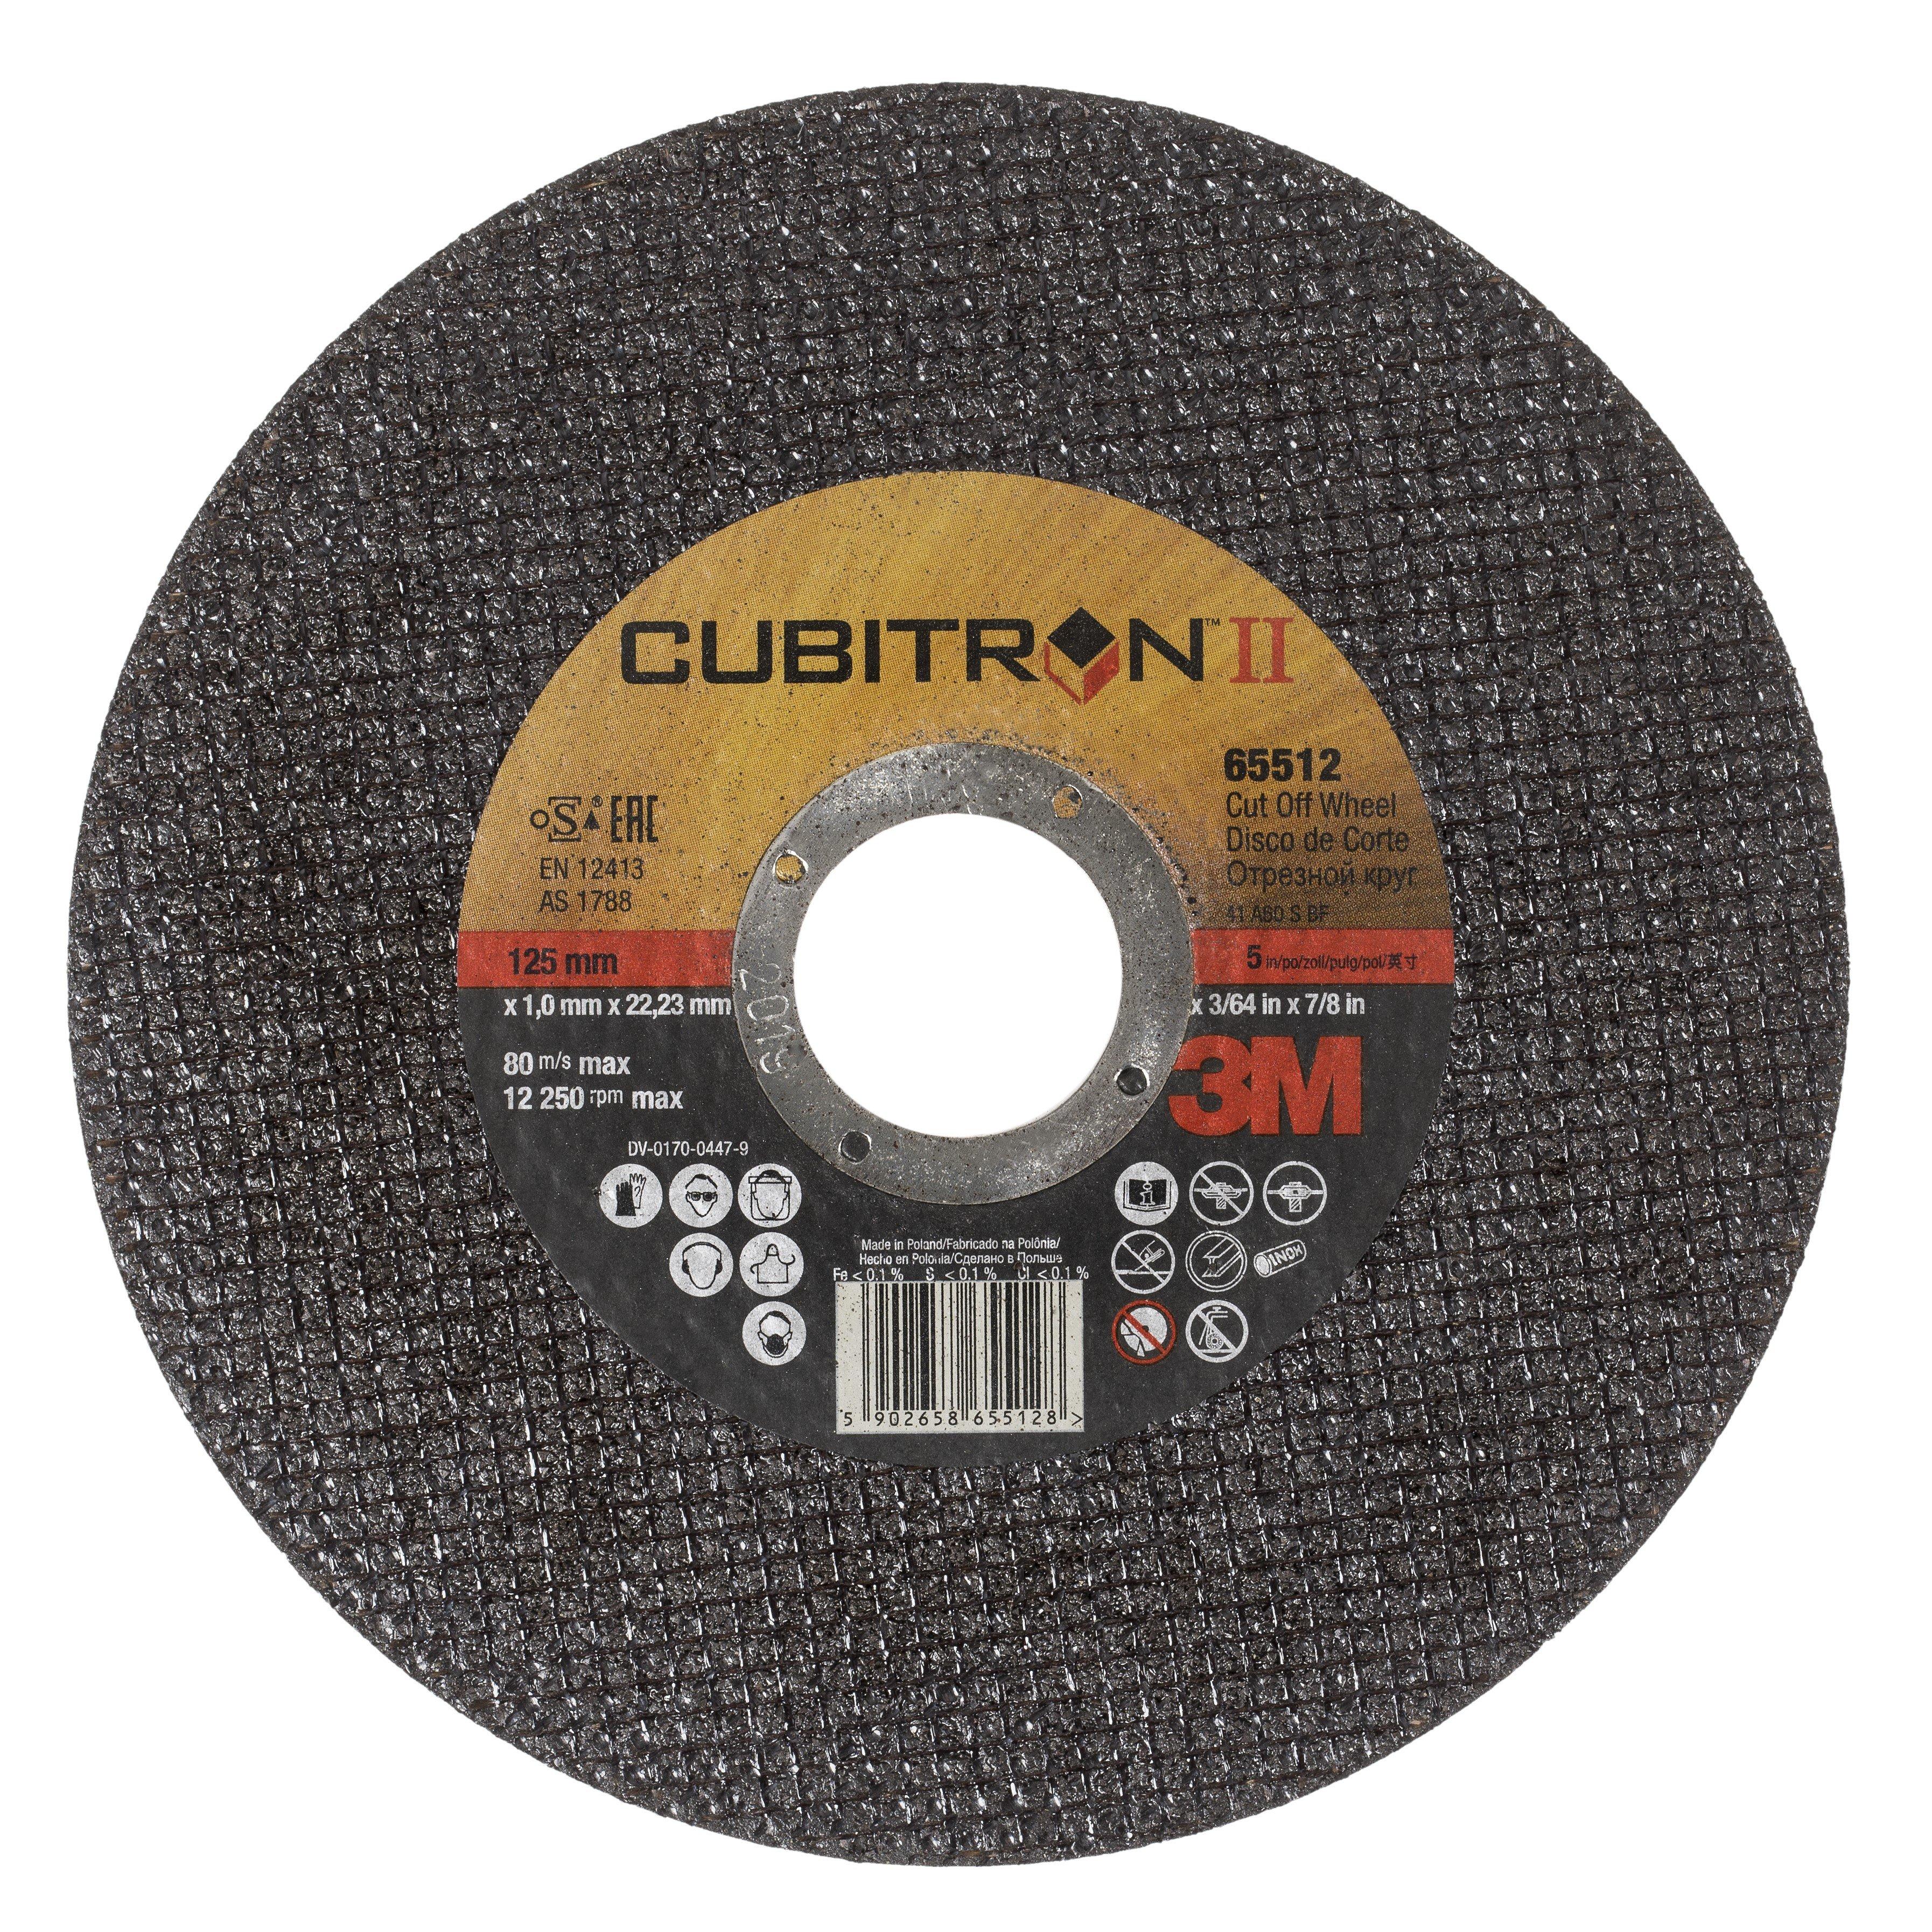 3M Cubitron II Ultra Thin Cut-Off Wheel